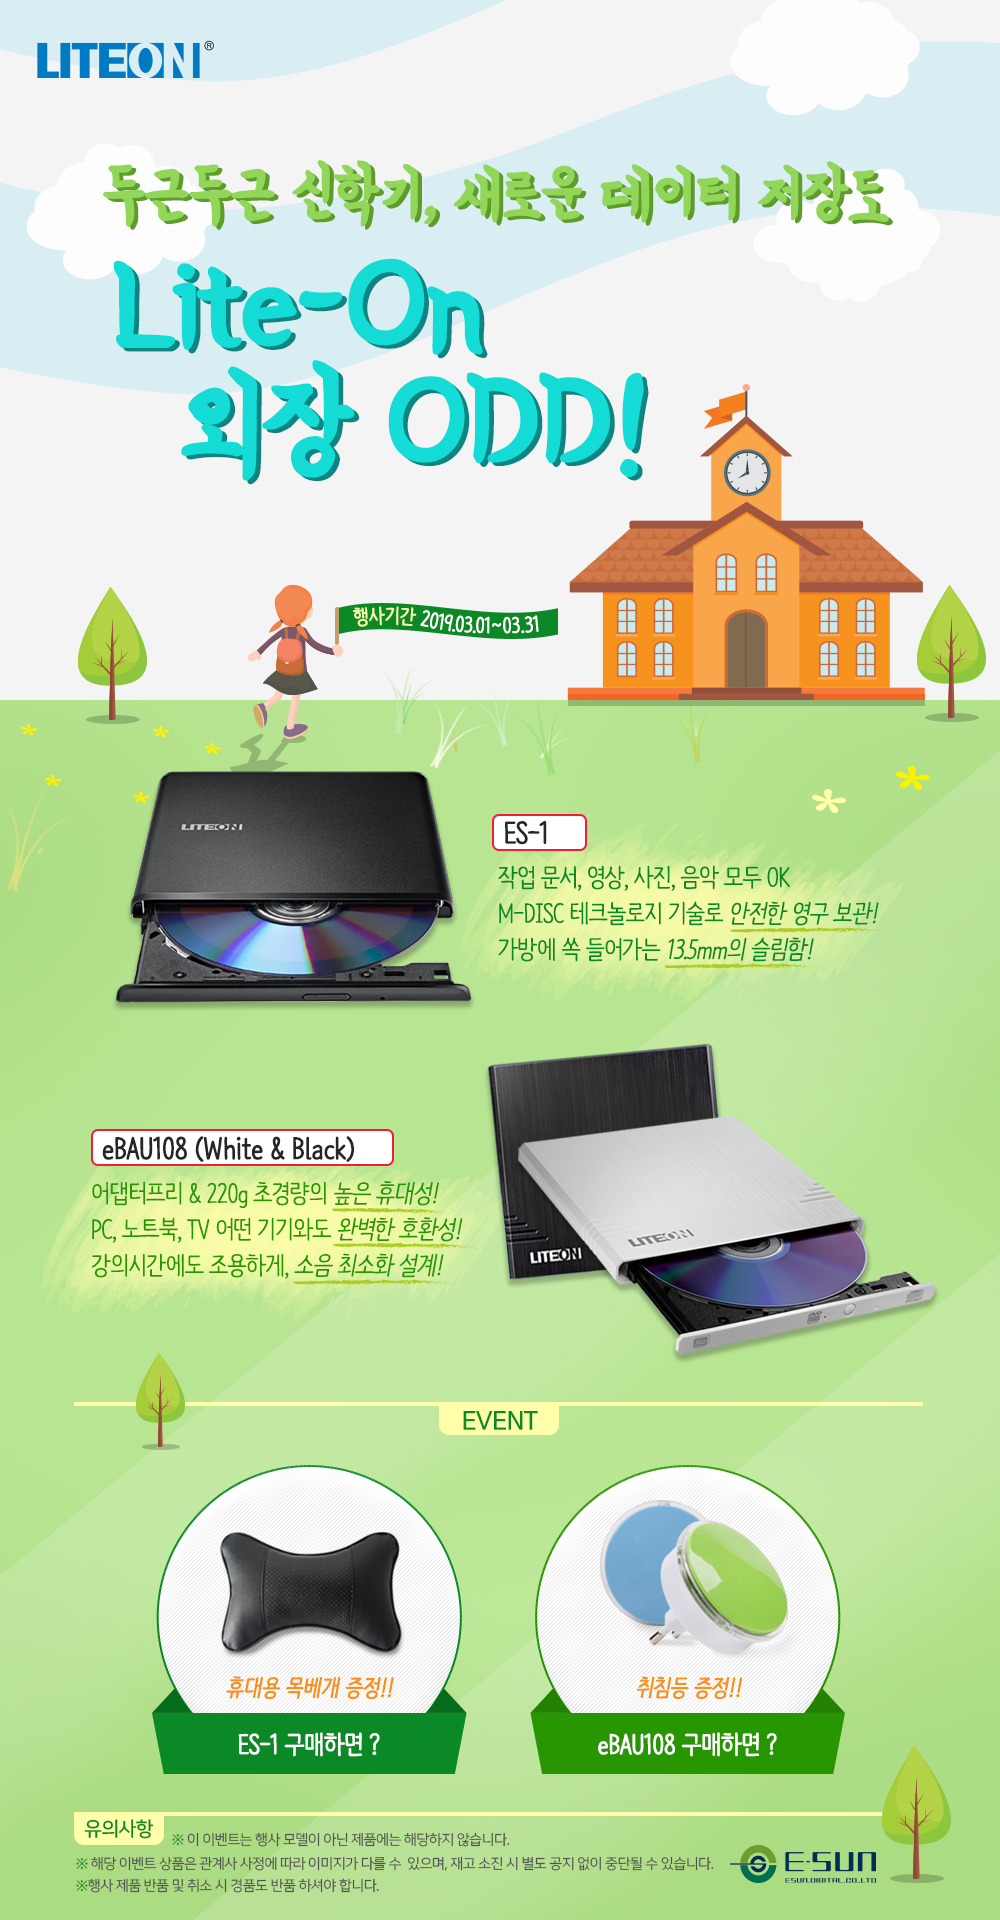 cb952a25529 라이트온, 외장형 ODD 구매자 대상으로 '신학기 맞이 외장 ODD 프로모션 ...